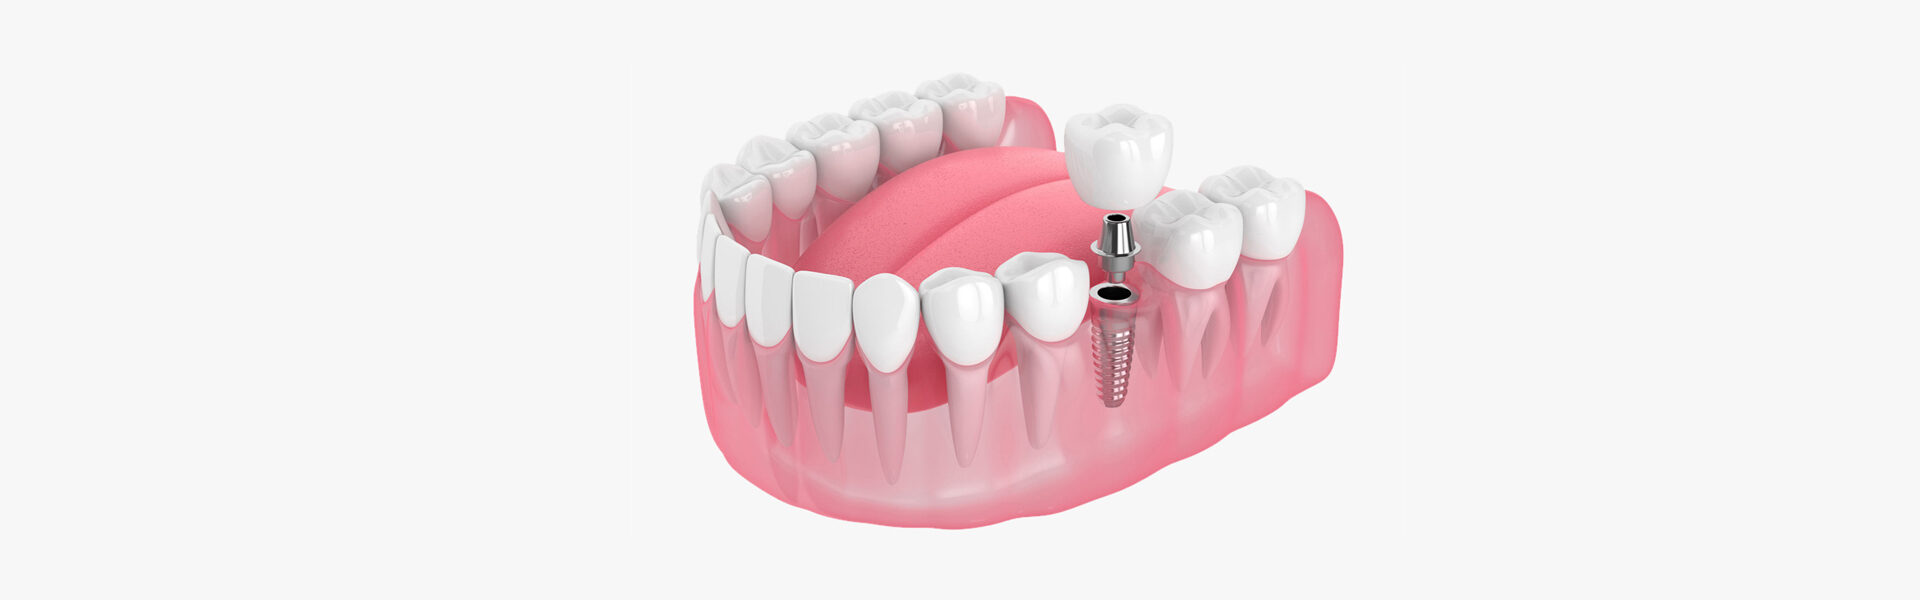 Dental Implants in East York, Toronto, ON